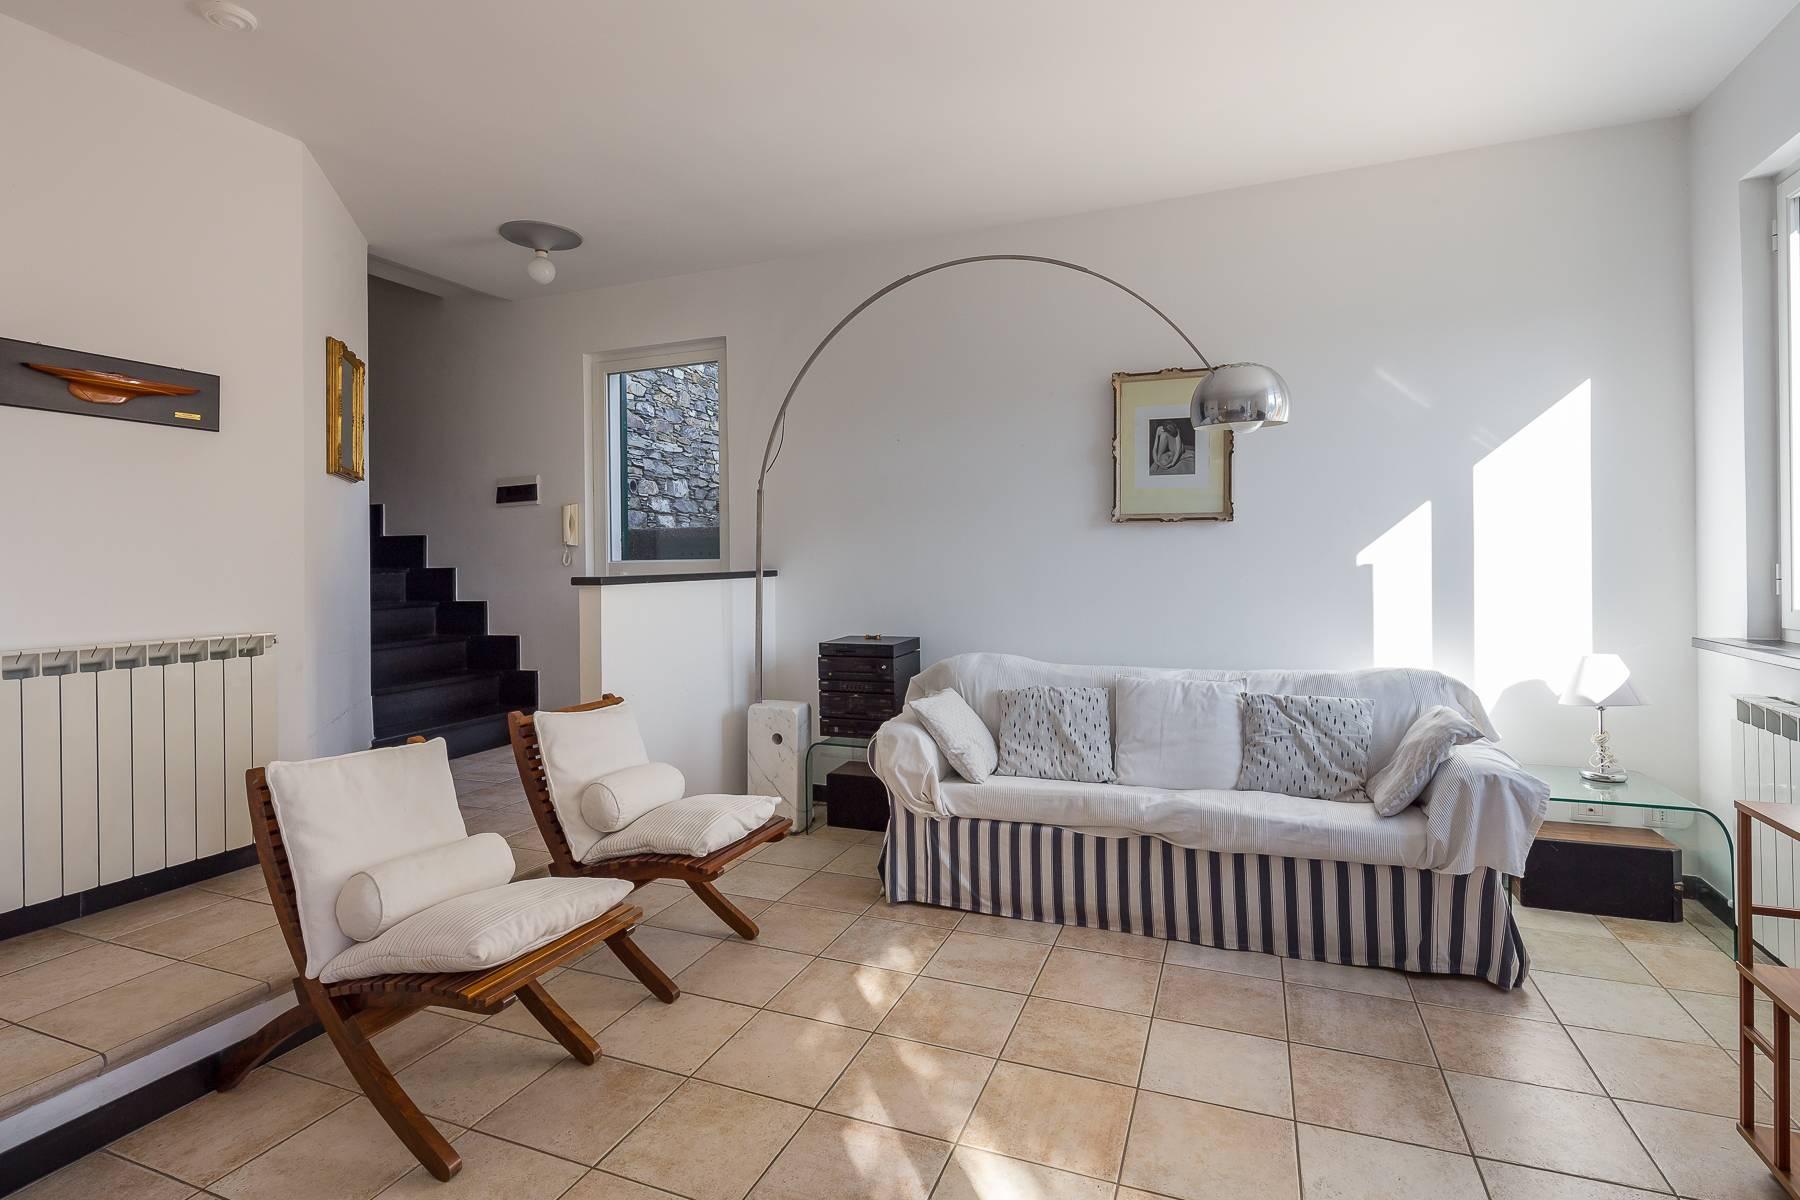 Casa indipendente in Vendita a Zoagli: 5 locali, 100 mq - Foto 20